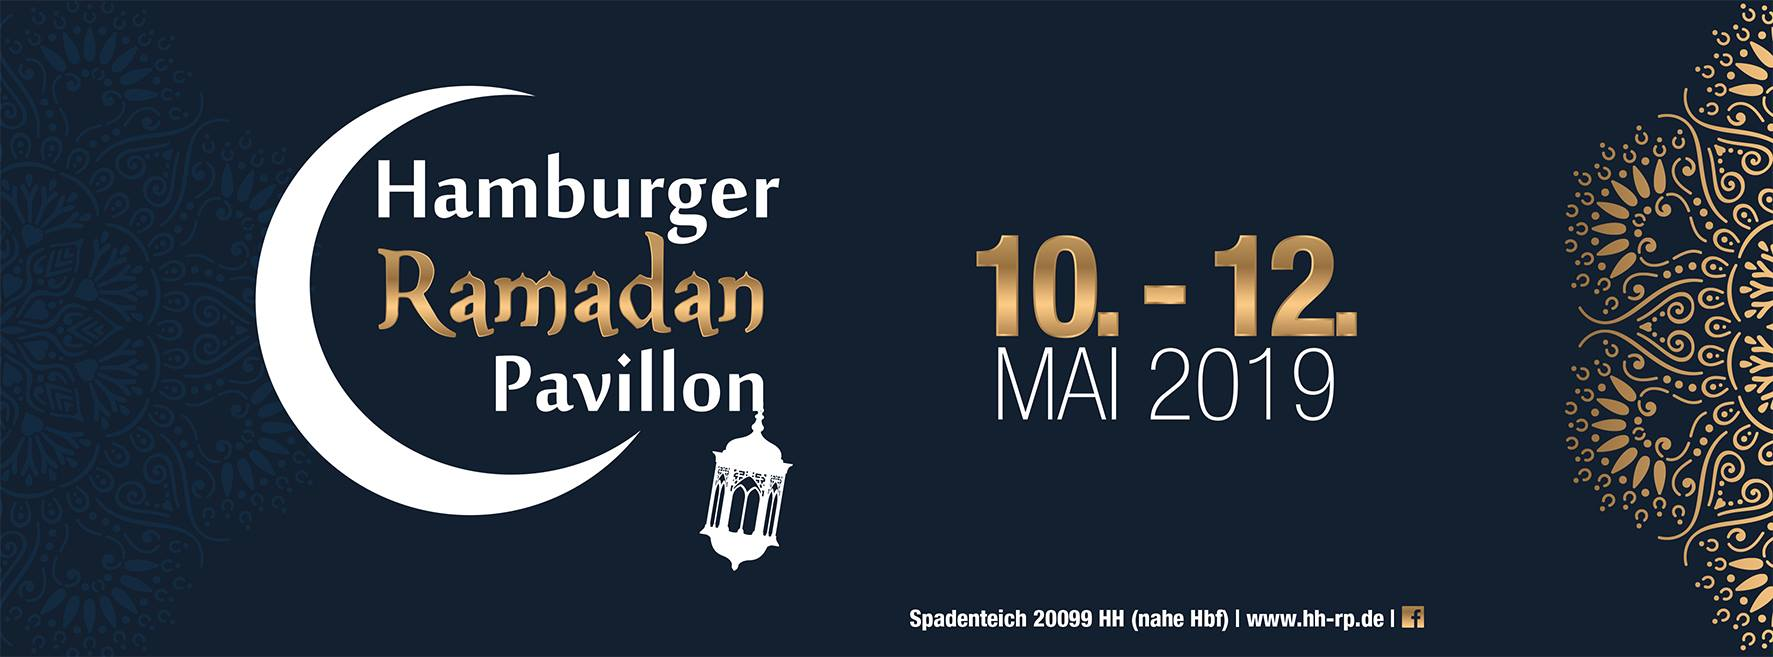 [:de]2. Pooltreffenzur Vorbereitung desHamburger Ramadan Pavillons 2019 [:]